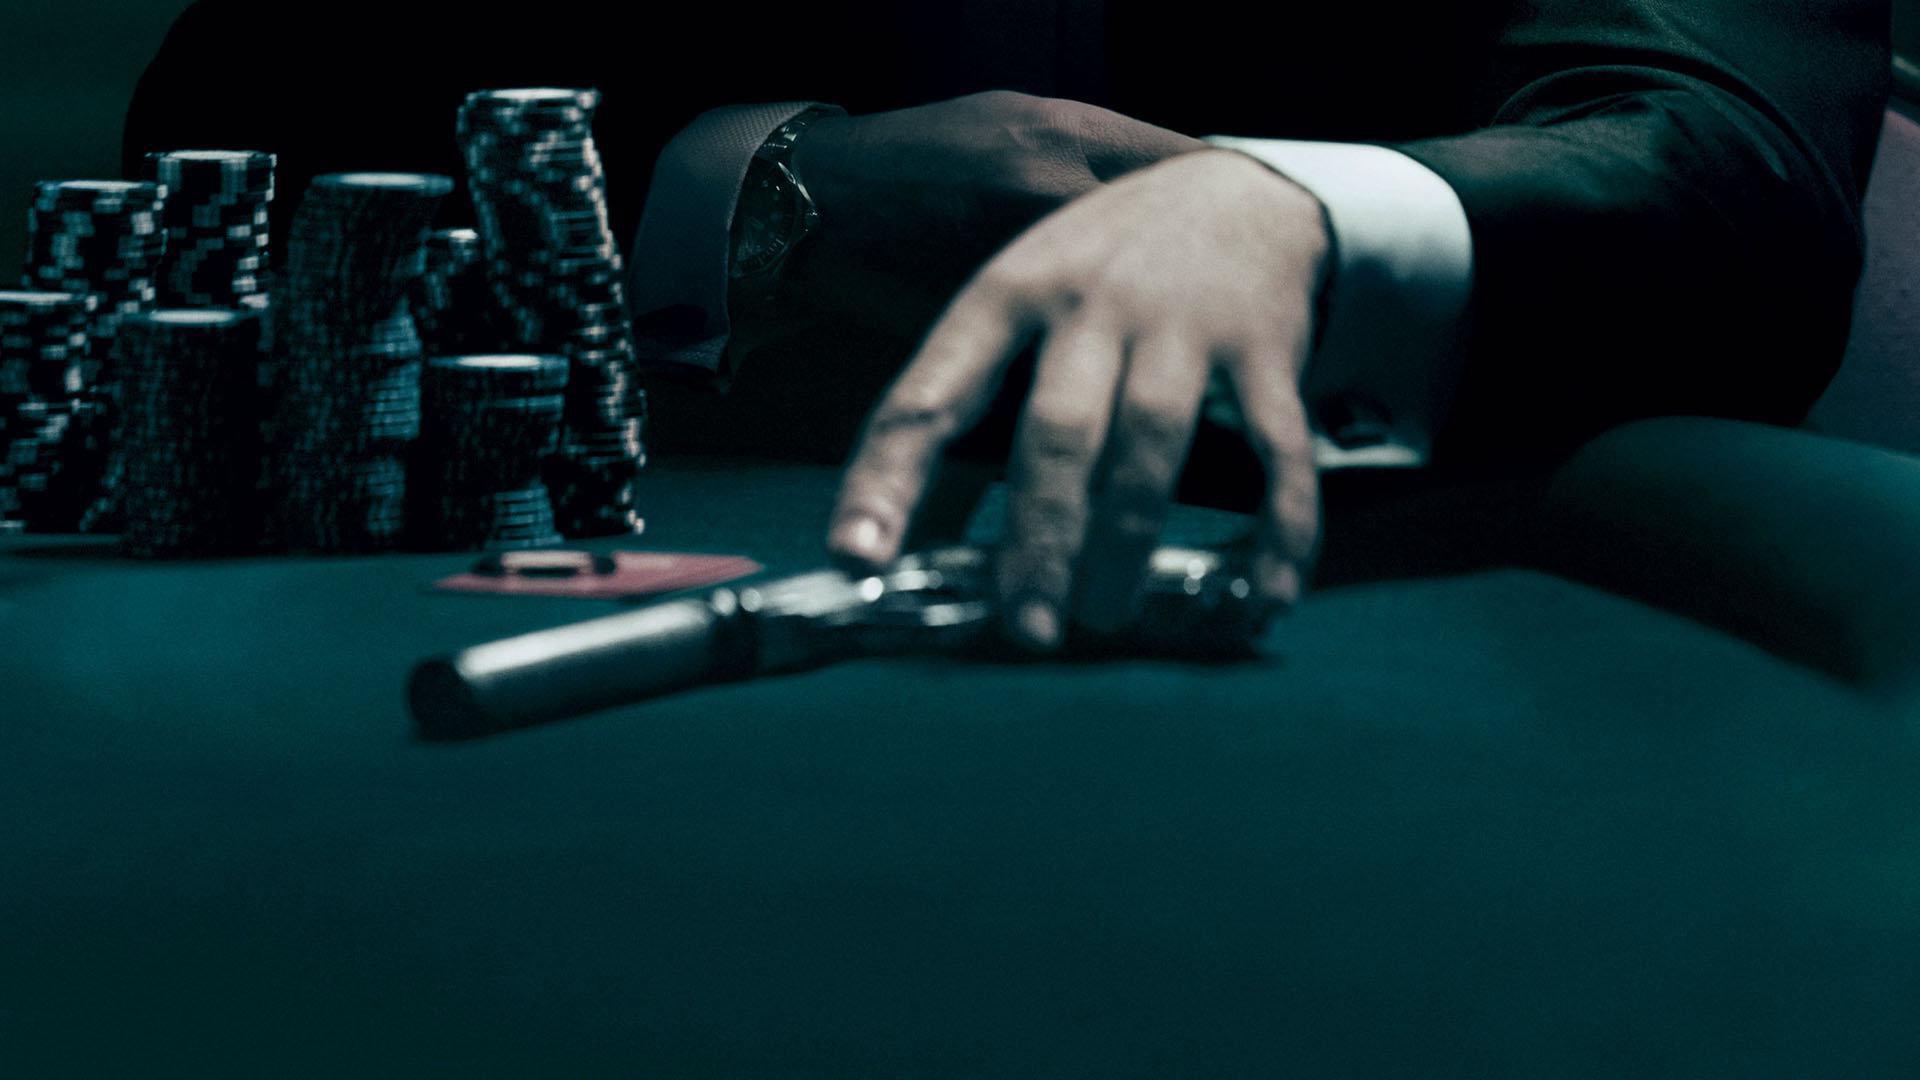 James Bond Skyfall 007 Gun wallpapers  Free stock photos